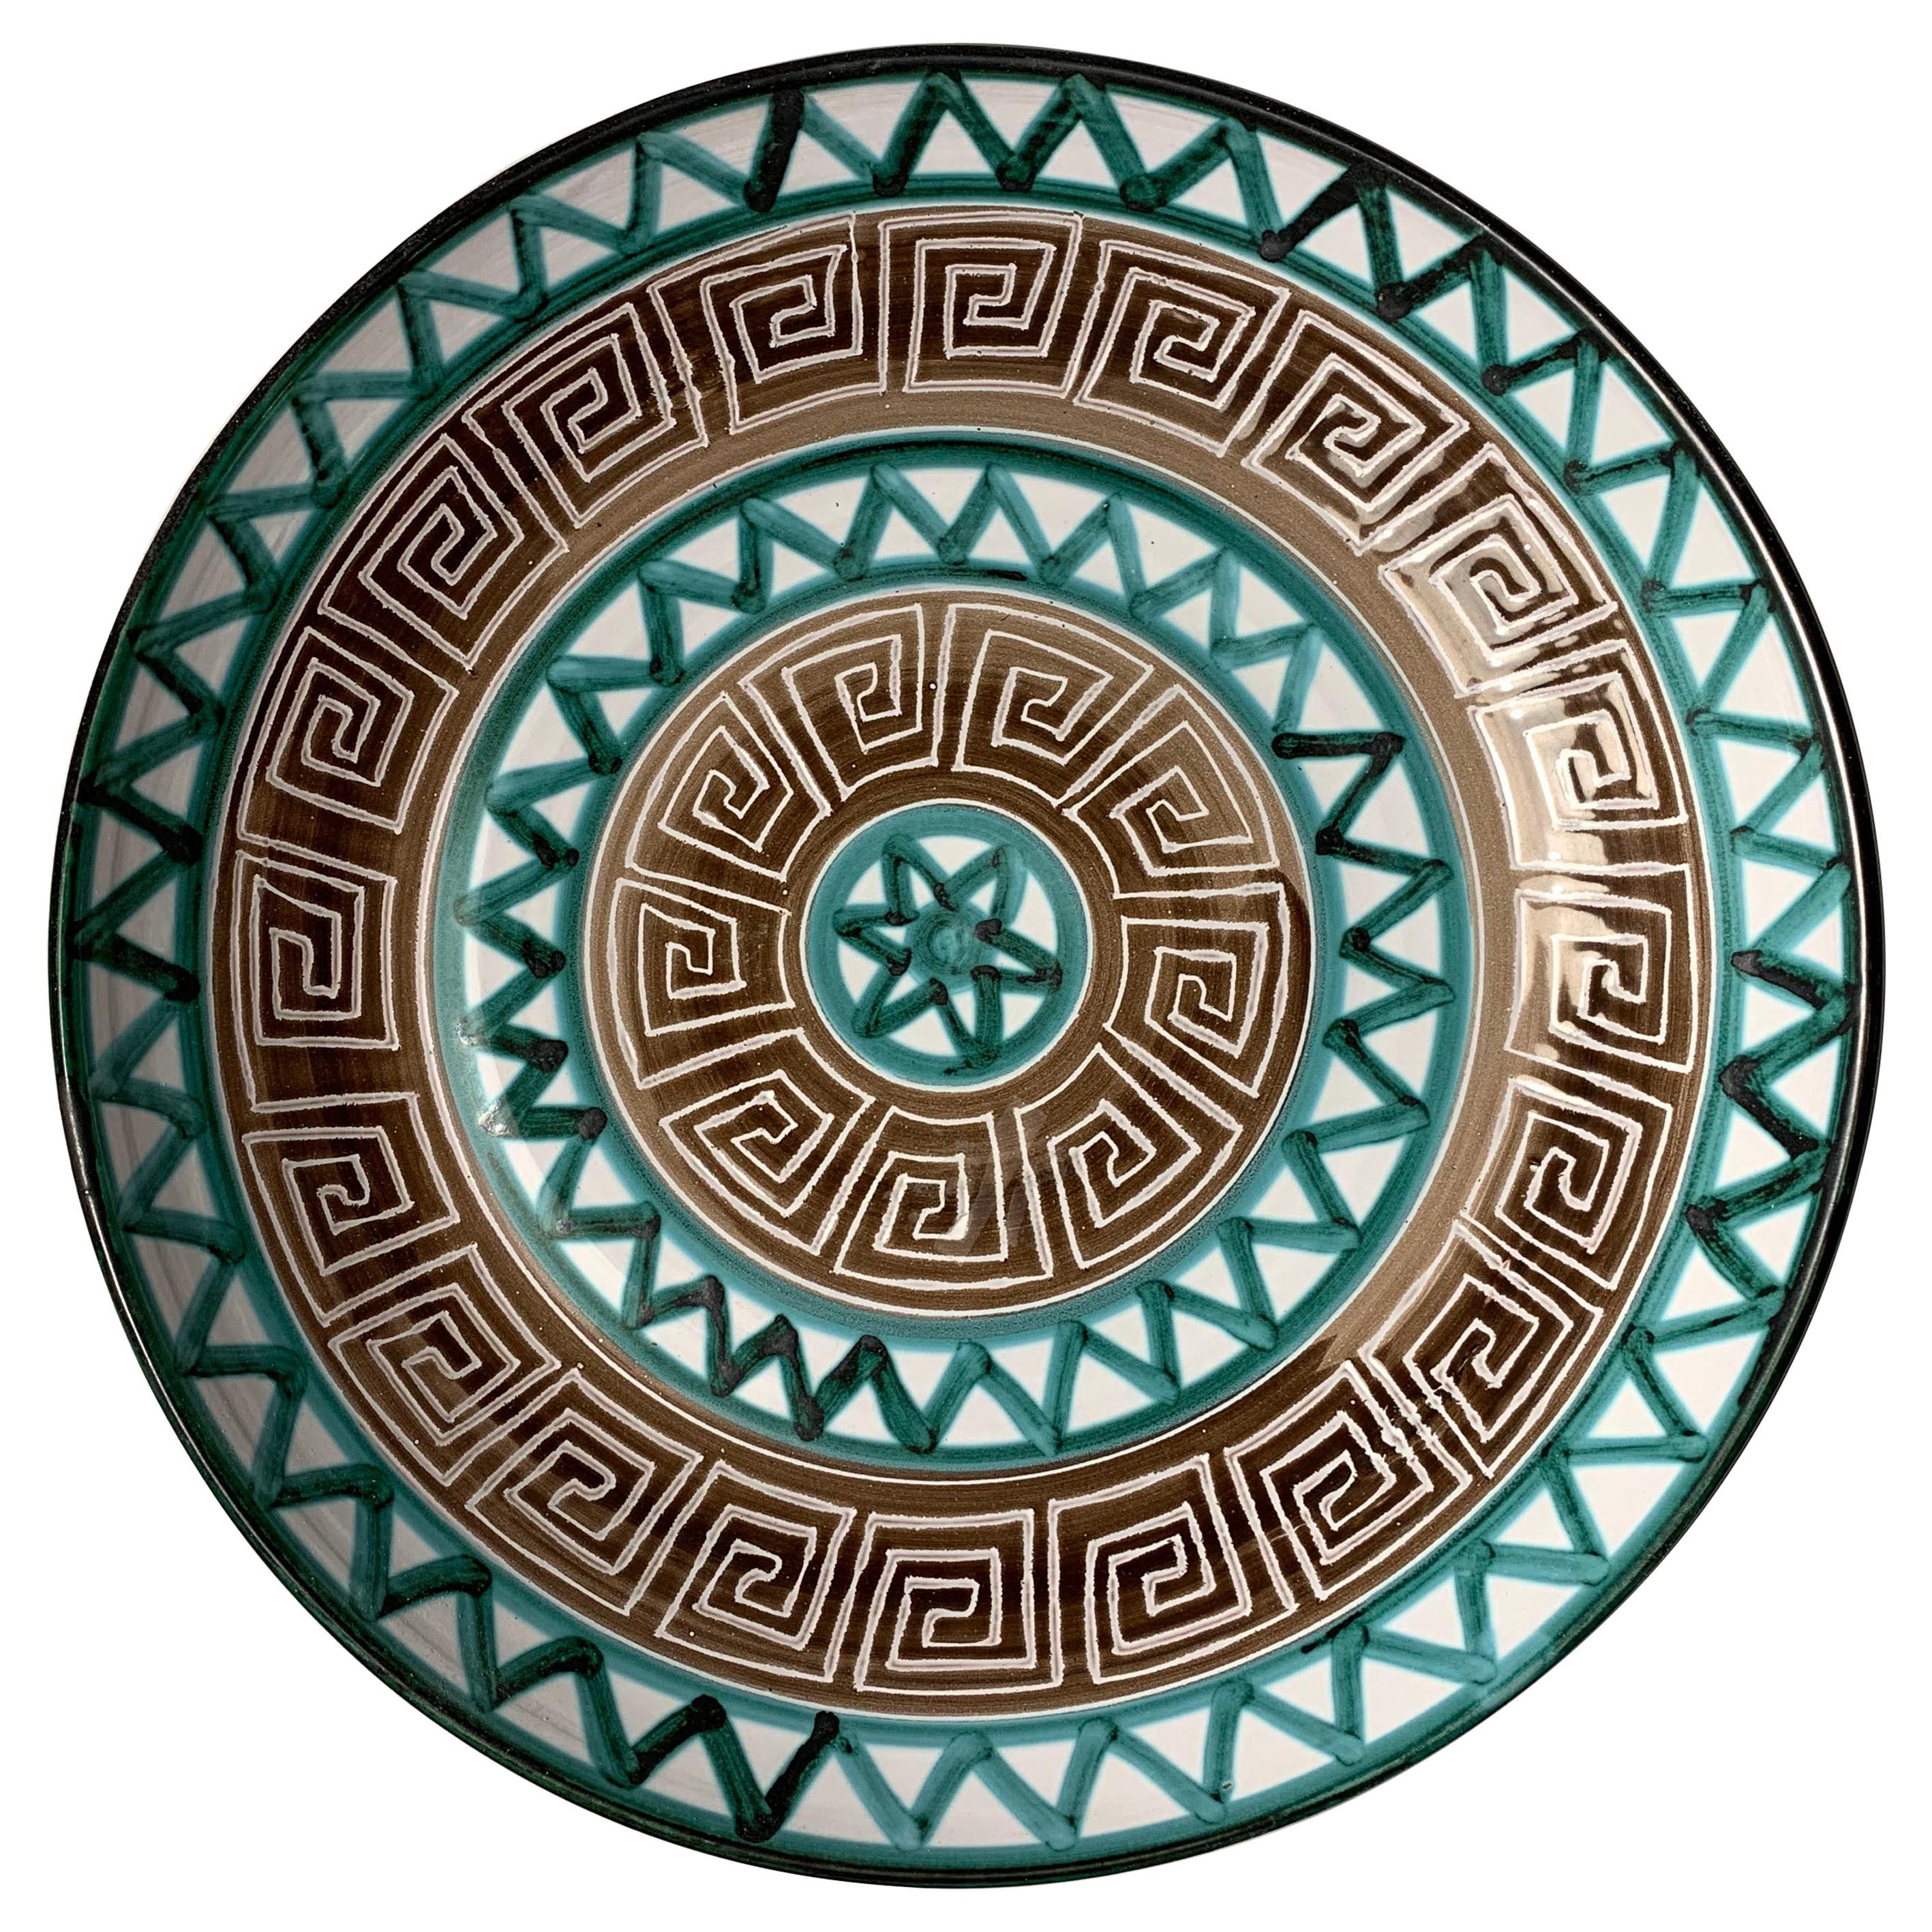 Robert Picault Large Centerpiece Bowl